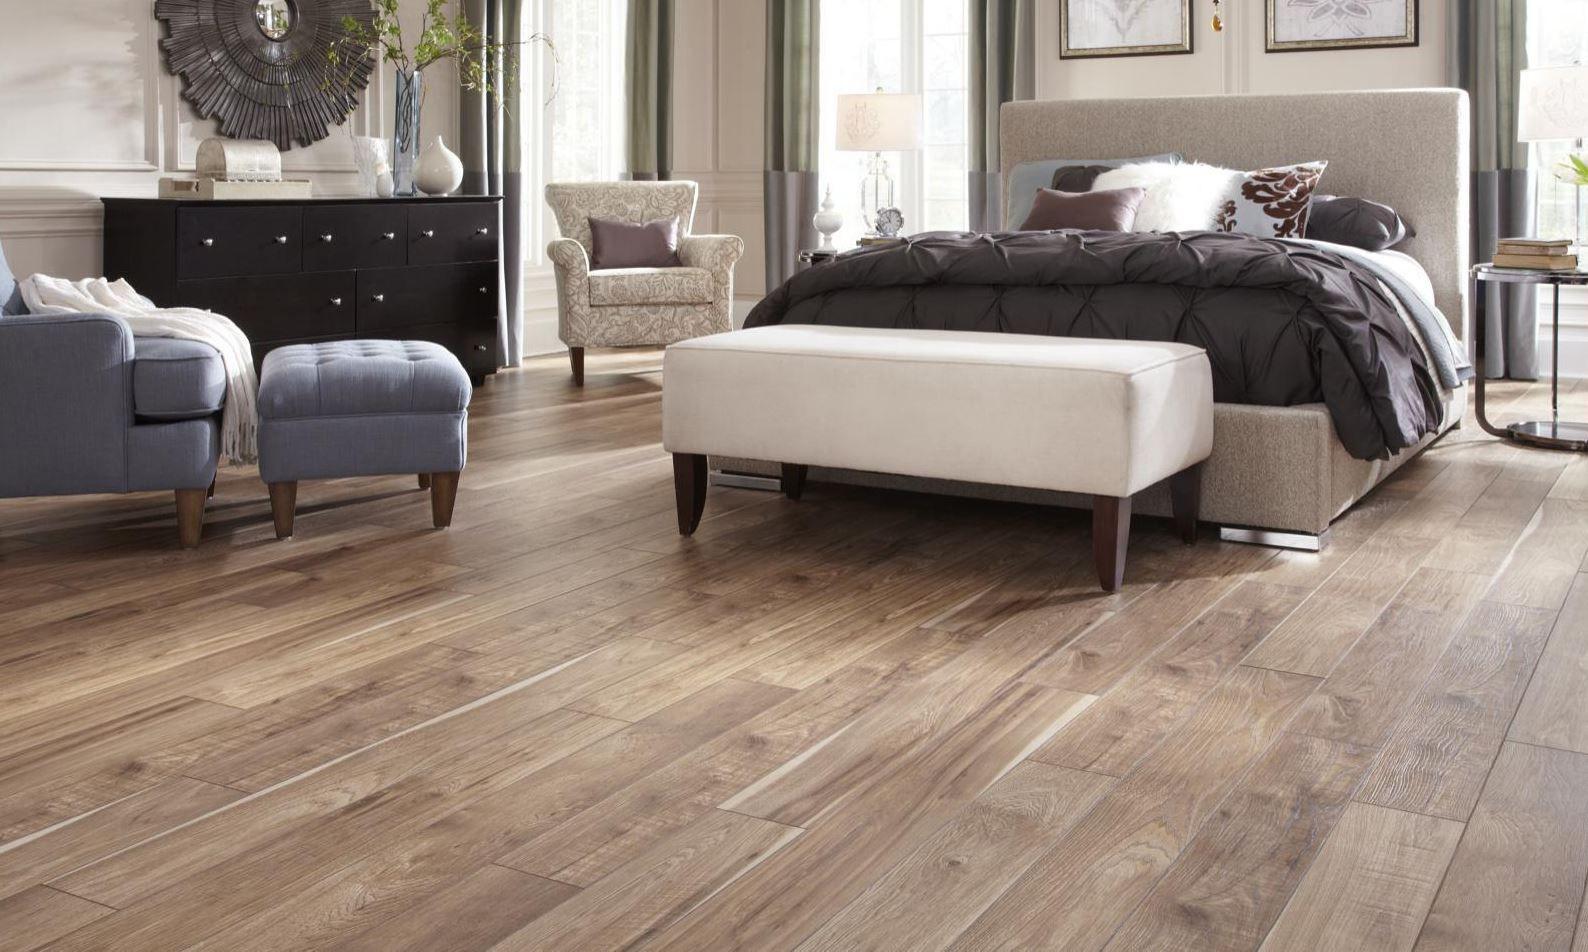 project source 5 in brown oak hardwood flooring of luxury vinyl plank flooring that looks like wood intended for mannington adura luxury vinyl plank flooring 57aa7d065f9b58974a2be49e jpg